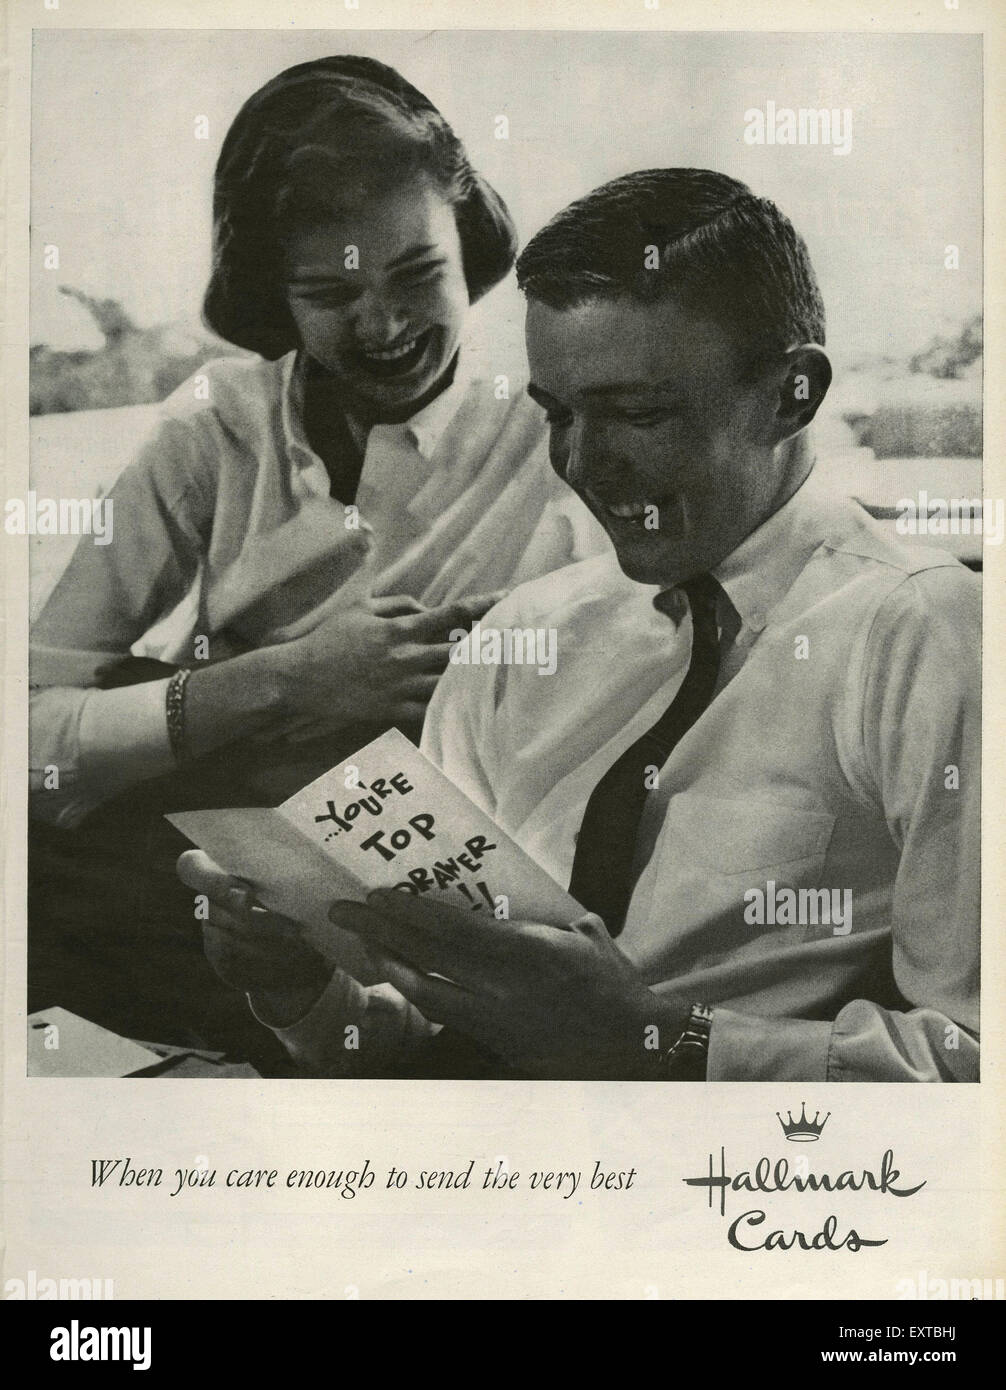 1960s USA Hallmark Magazine Advert - Stock Image